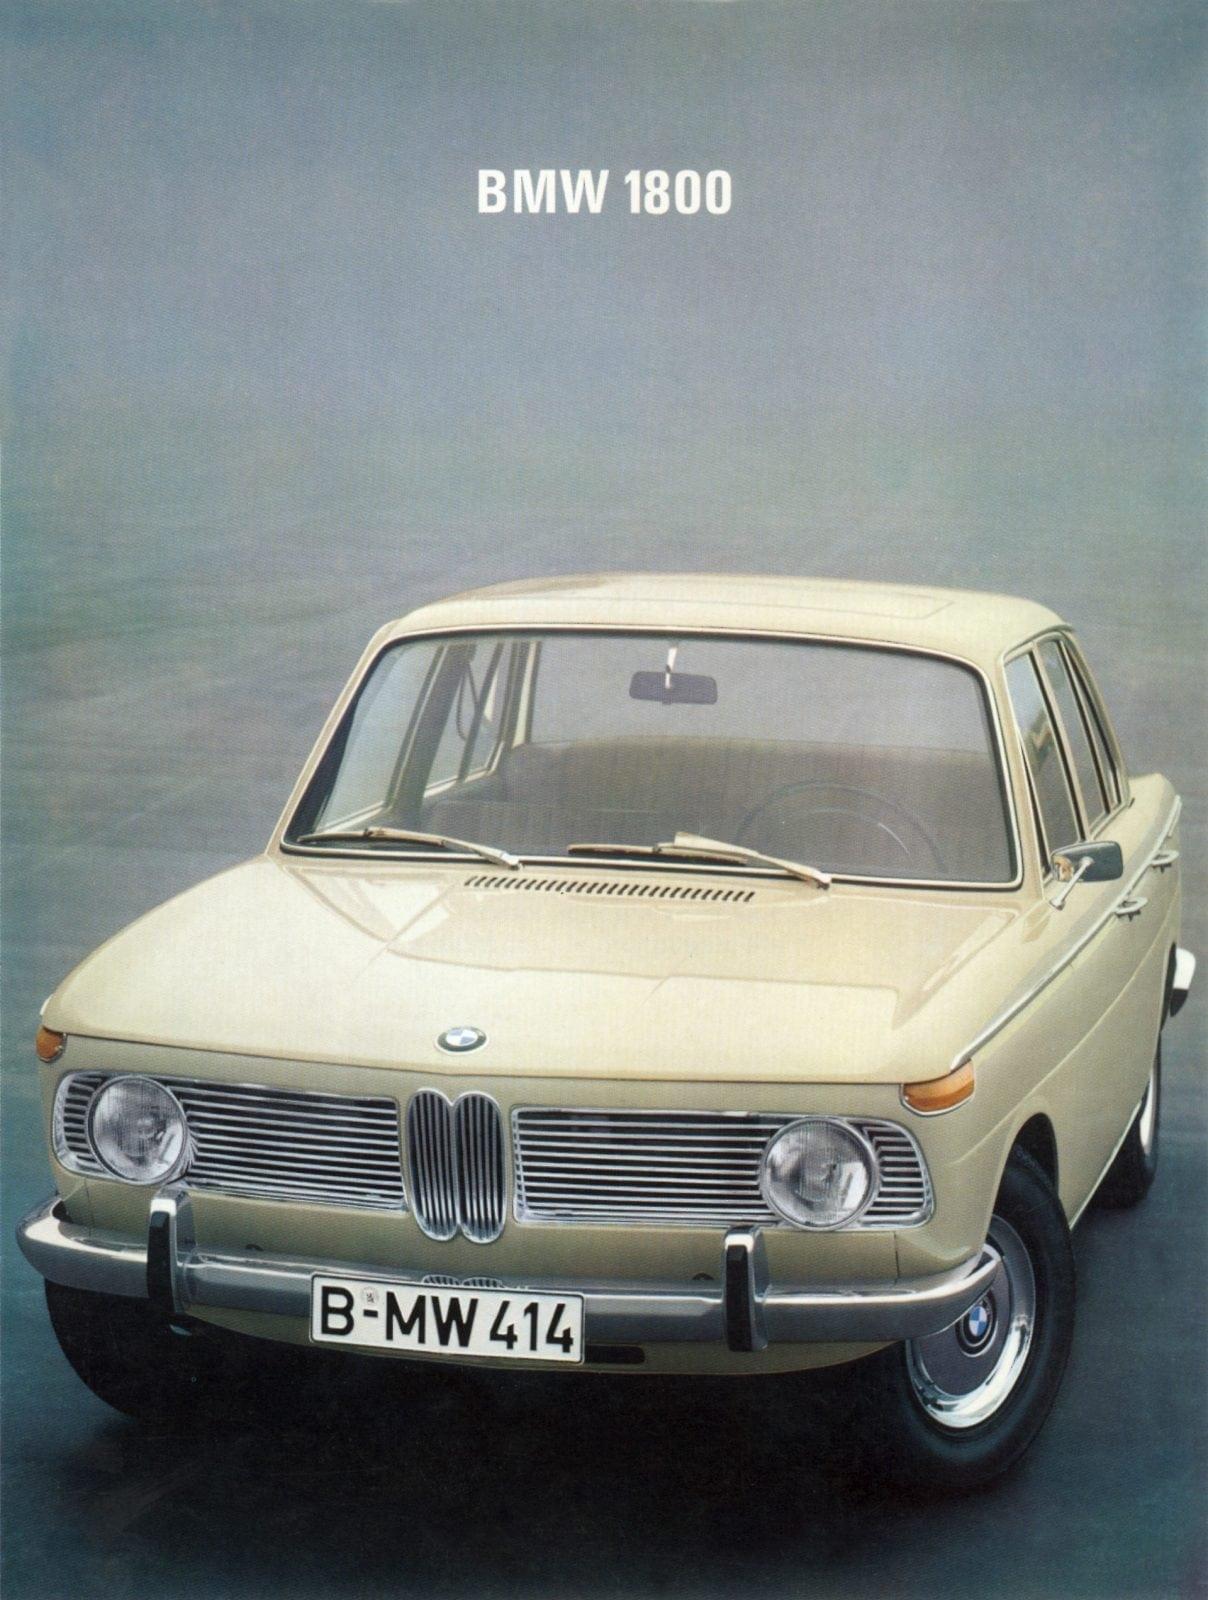 50 Years of BMW New Class, BMW 1800 (03/2011)